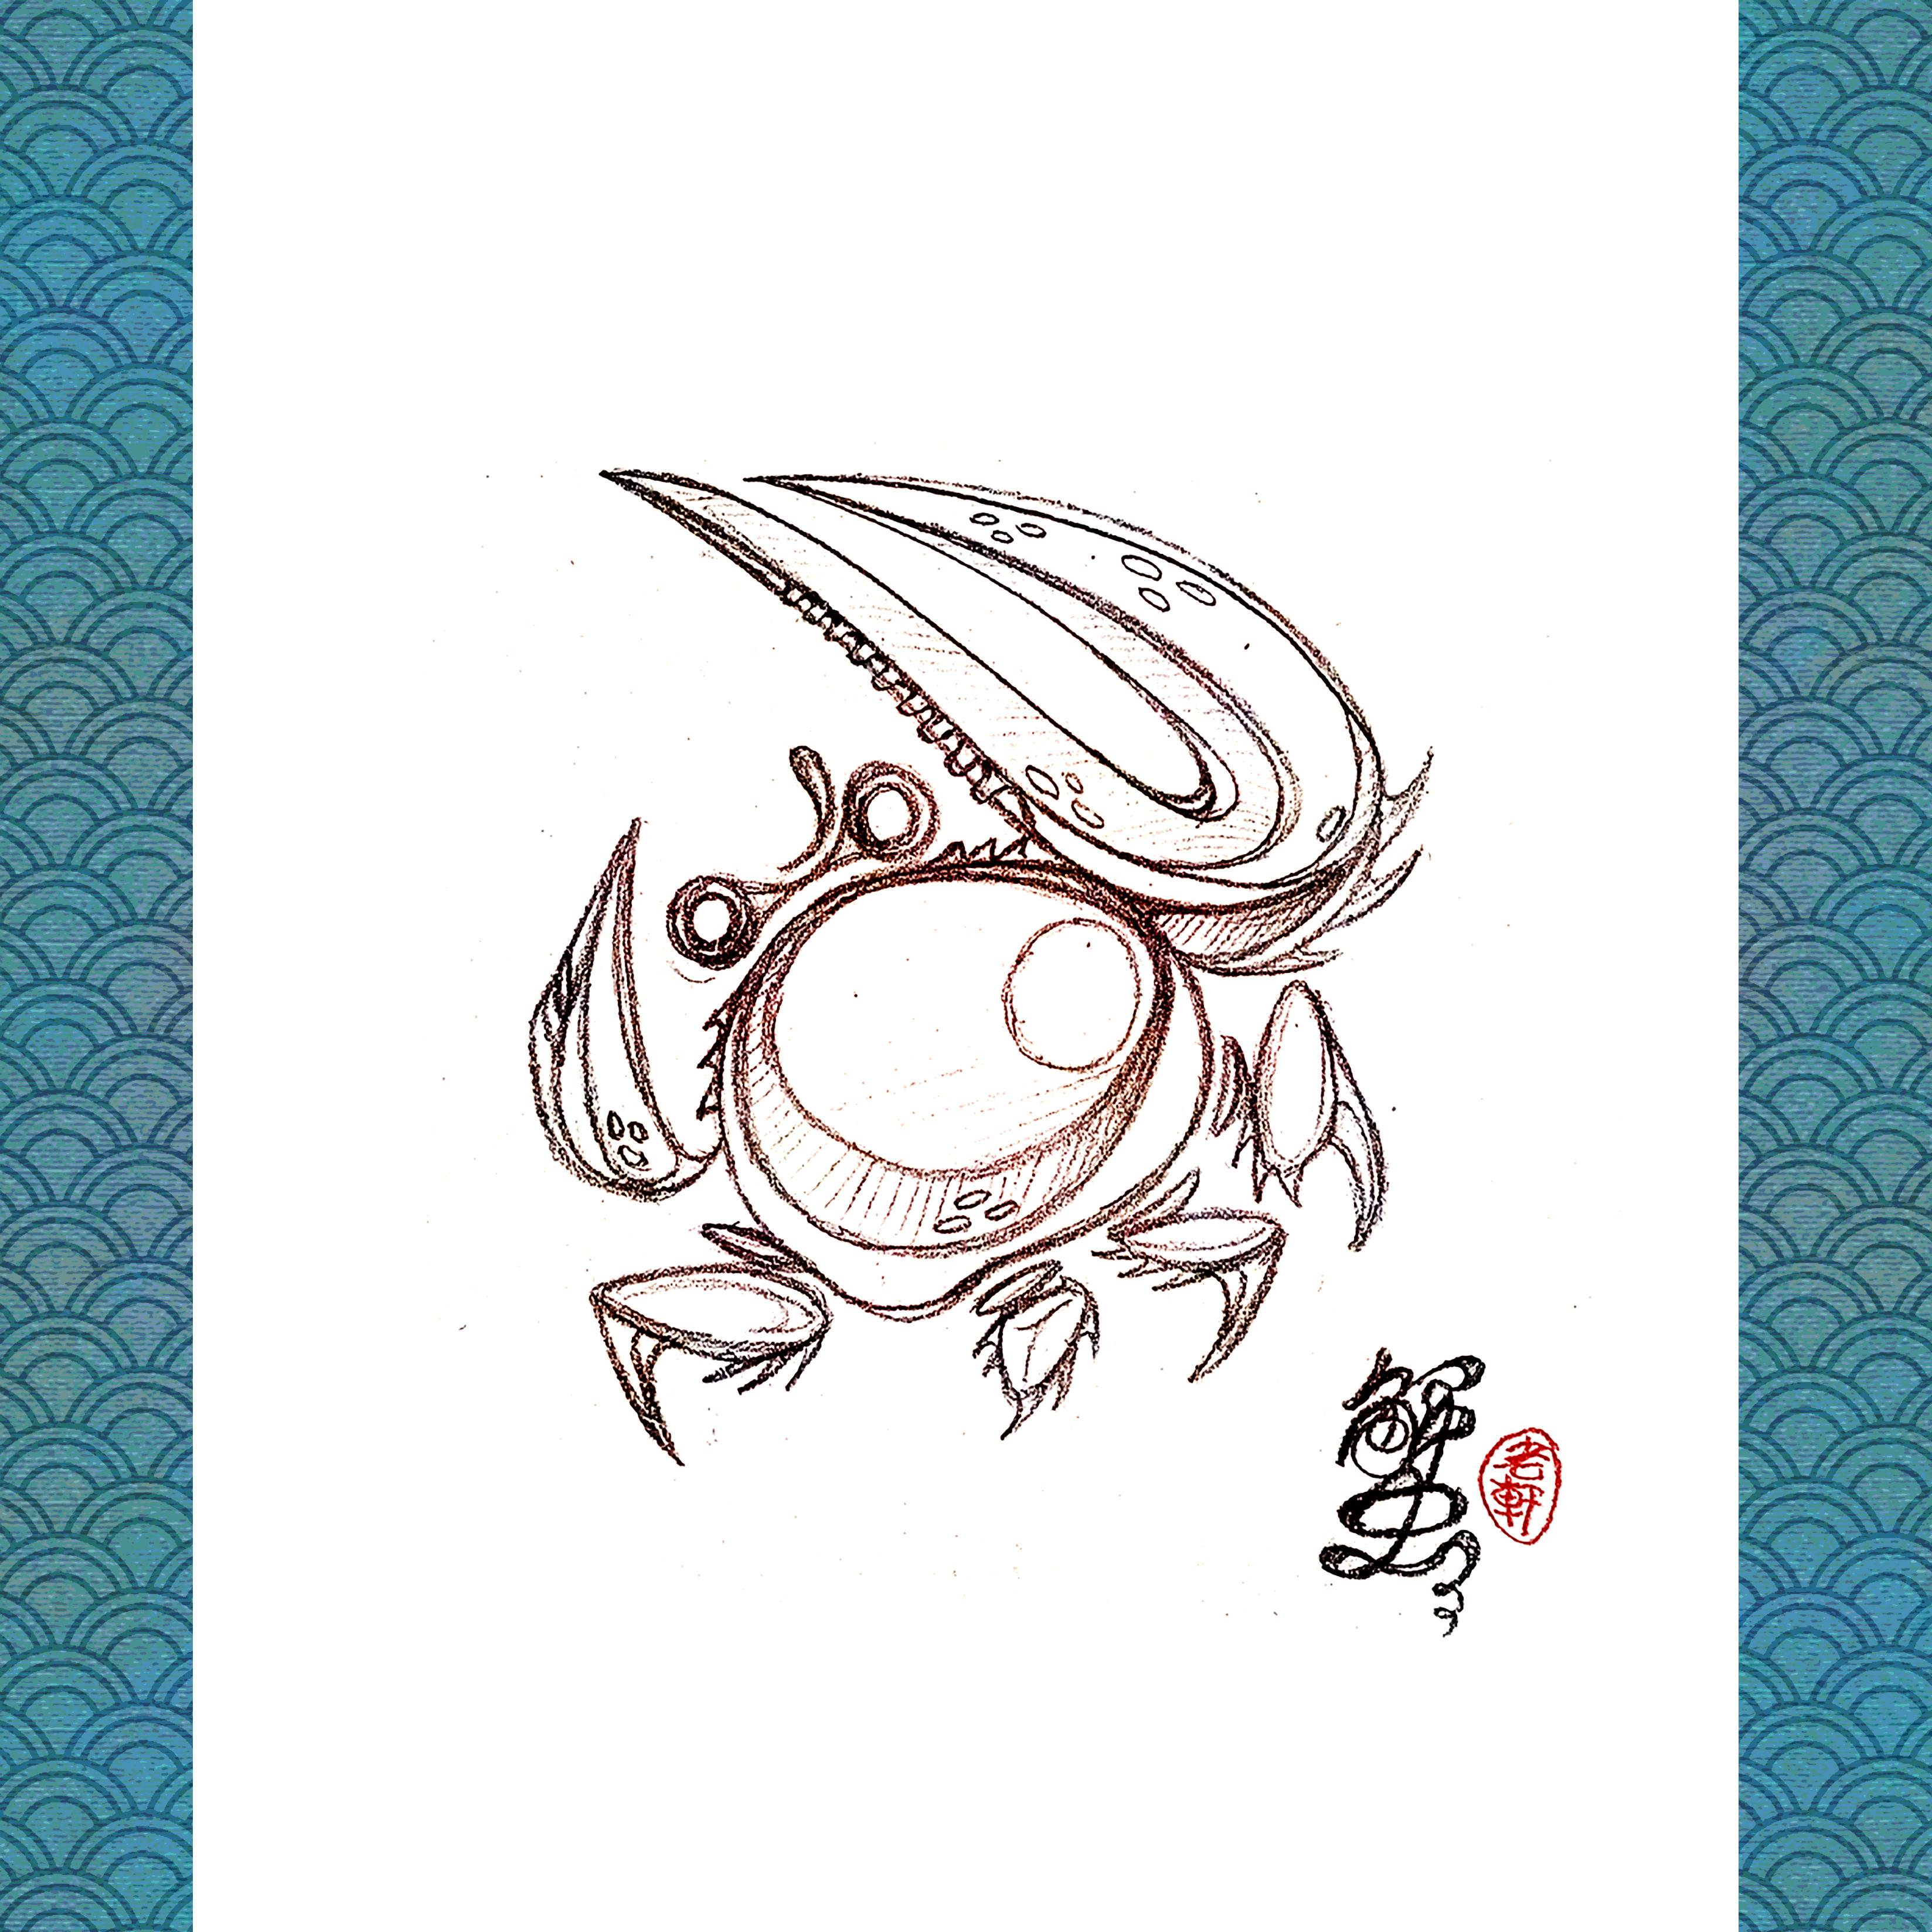 Grumpy Fiddler Crab